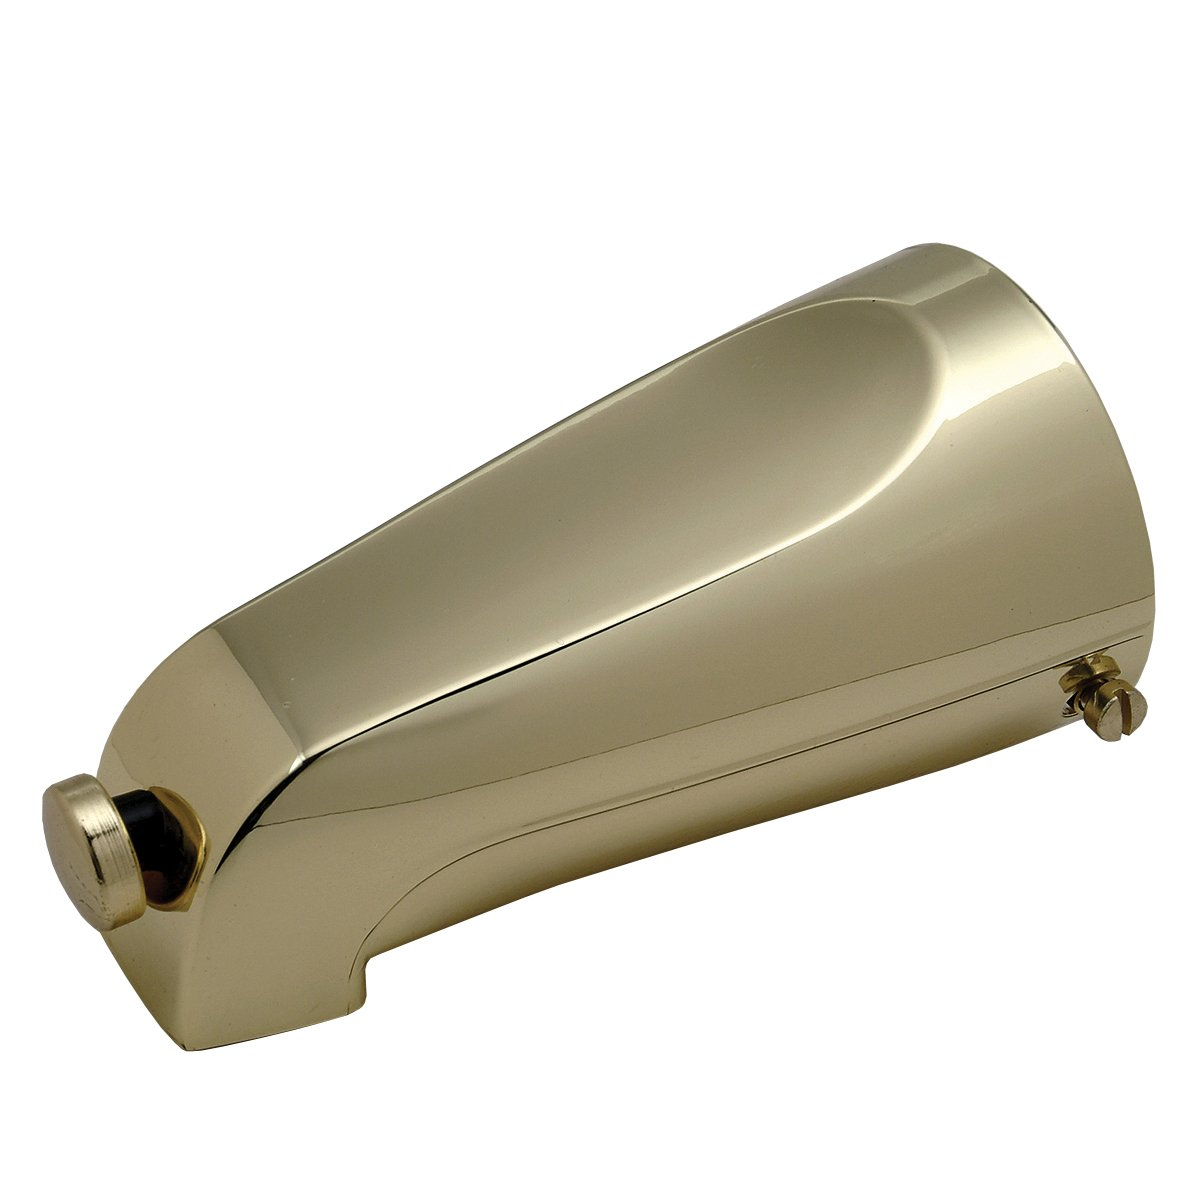 Brasscraft Mfg Mixet #71 Pb Bulk 51/8'' Quikspout SlipOn Diverter Tub Spout Polished Brass